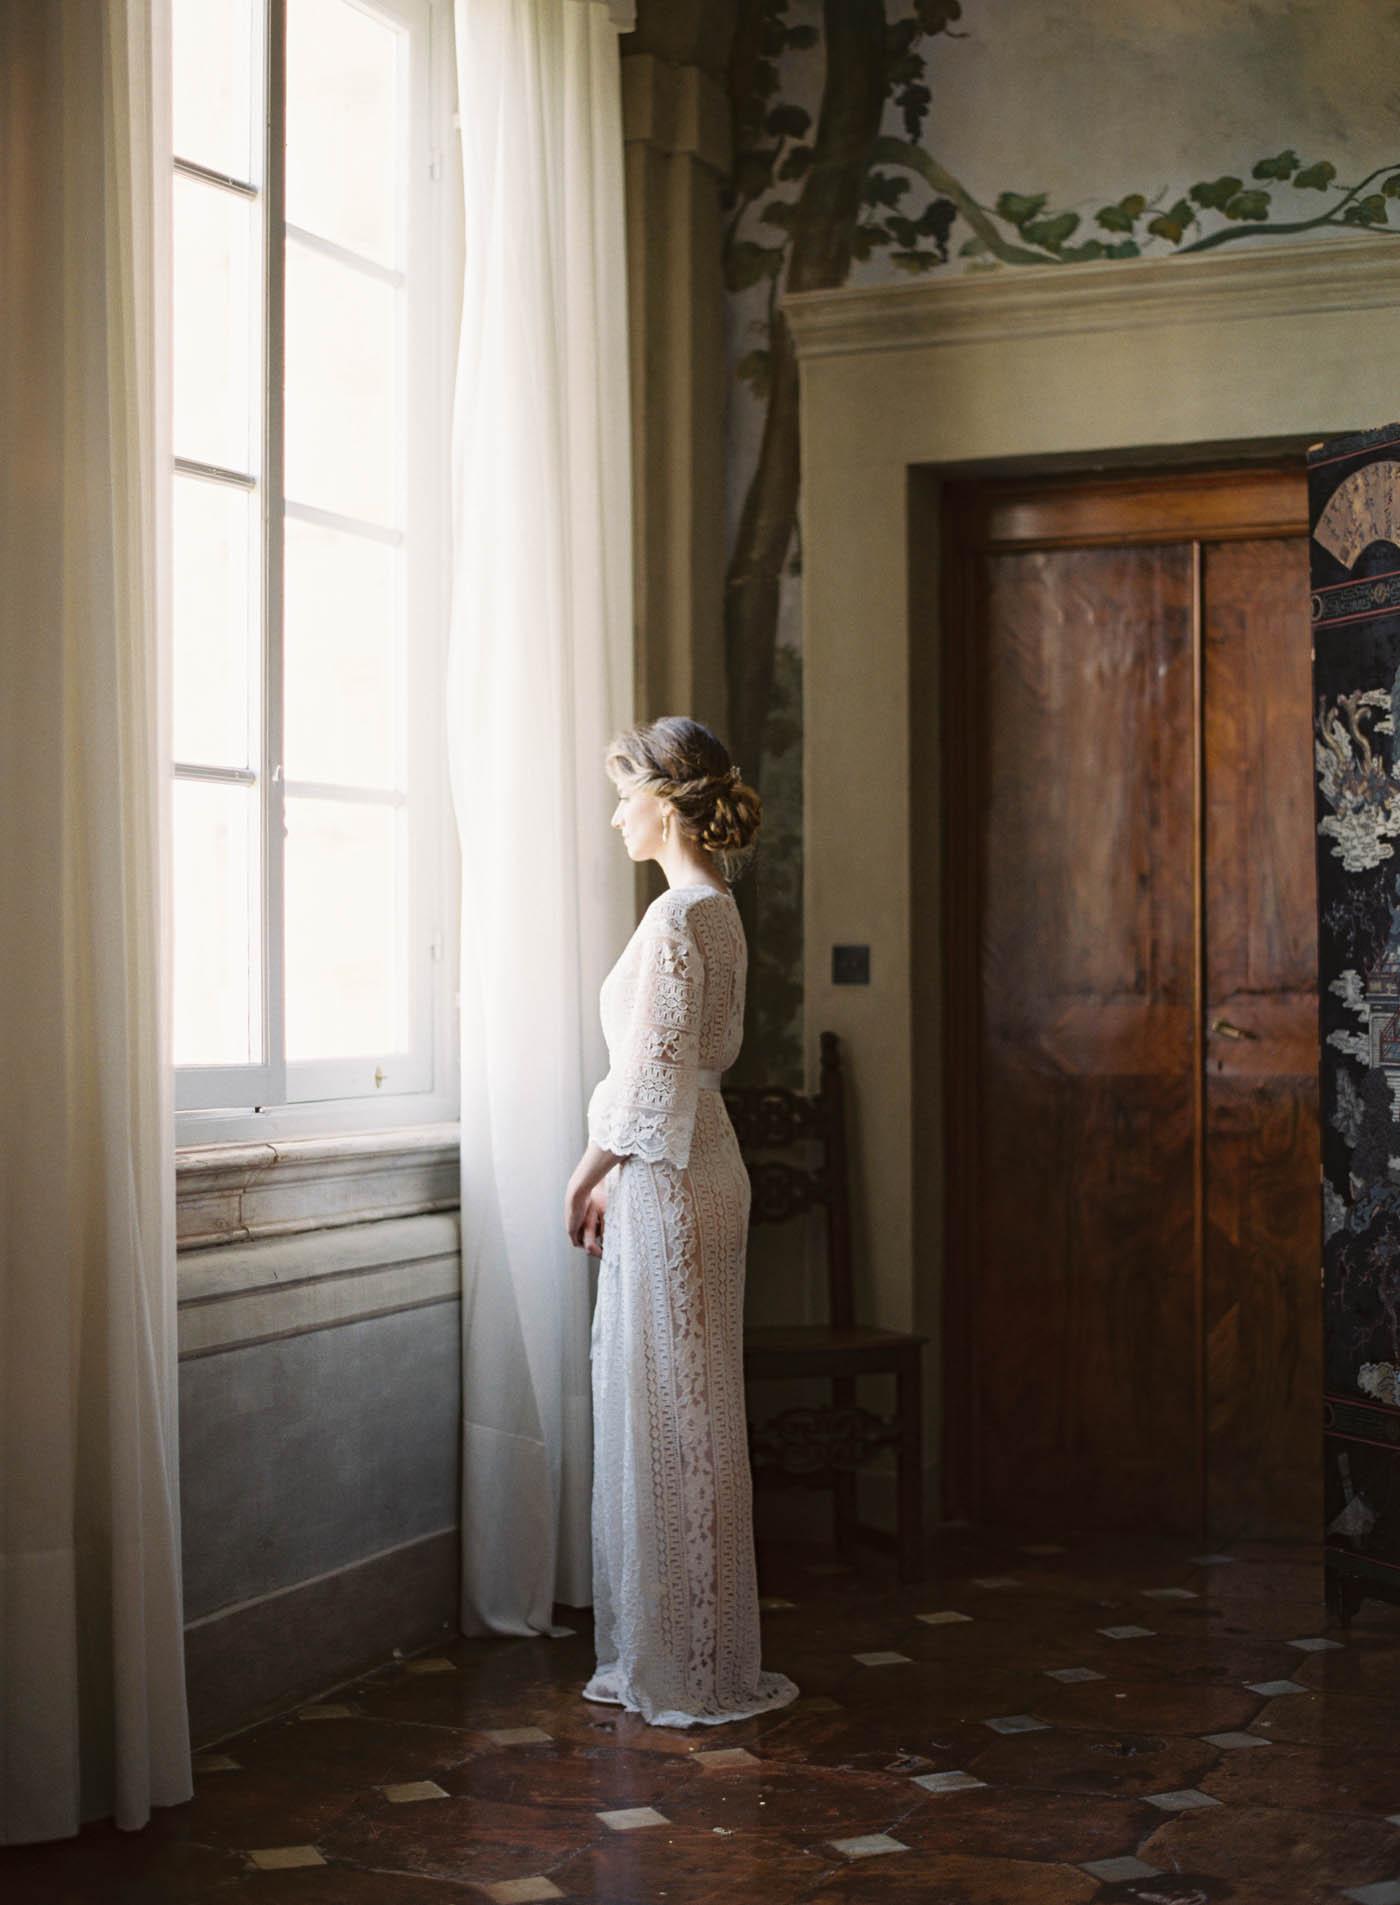 Villa_Cetinale_Wedding-4-Jen_Huang-ElanJacob-115-Jen_Huang-007322-R1-007.jpg